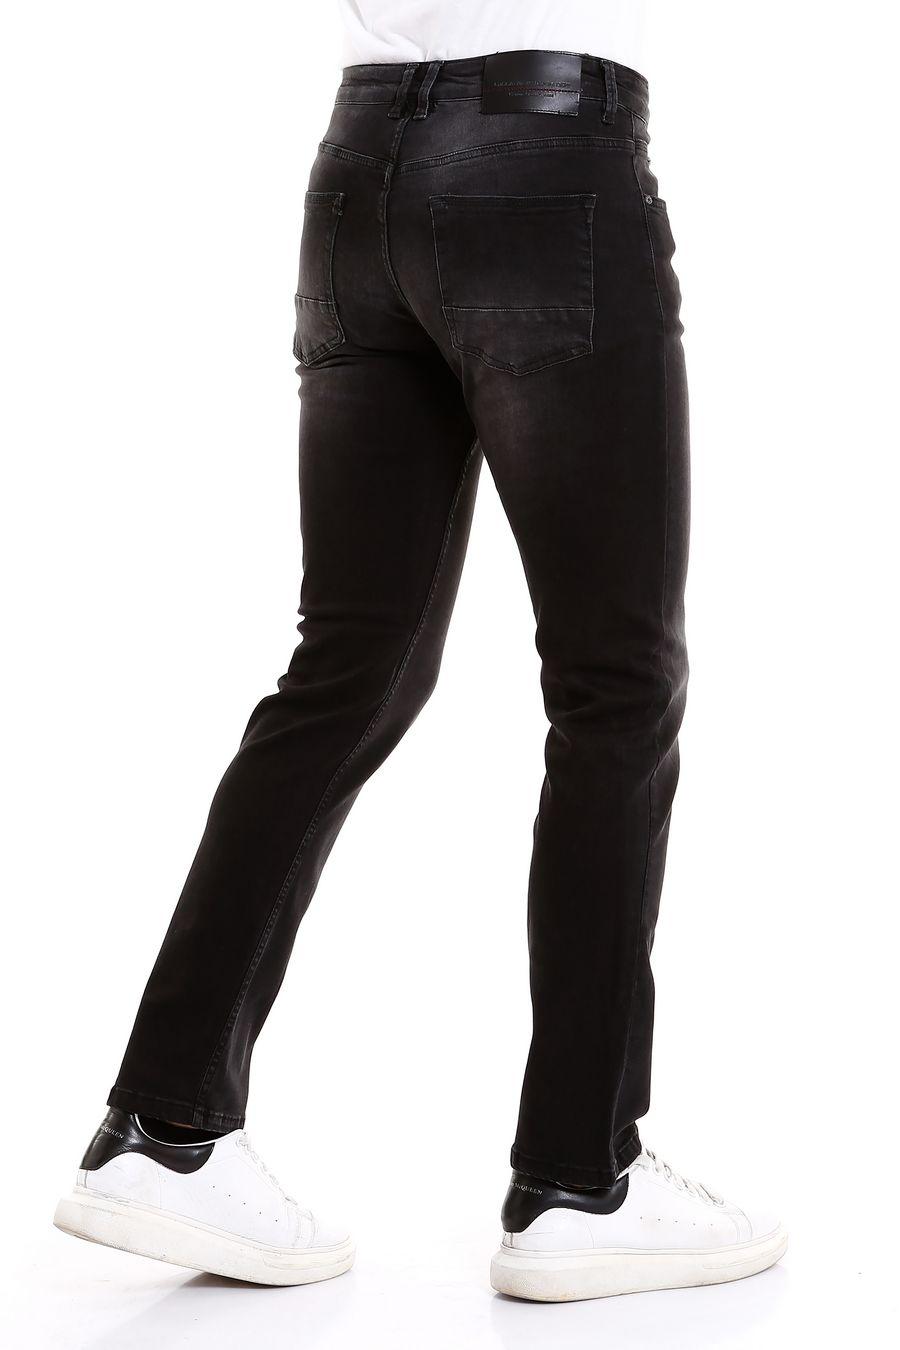 Джинсы мужские Caccia 2046 Black Black - фото 2